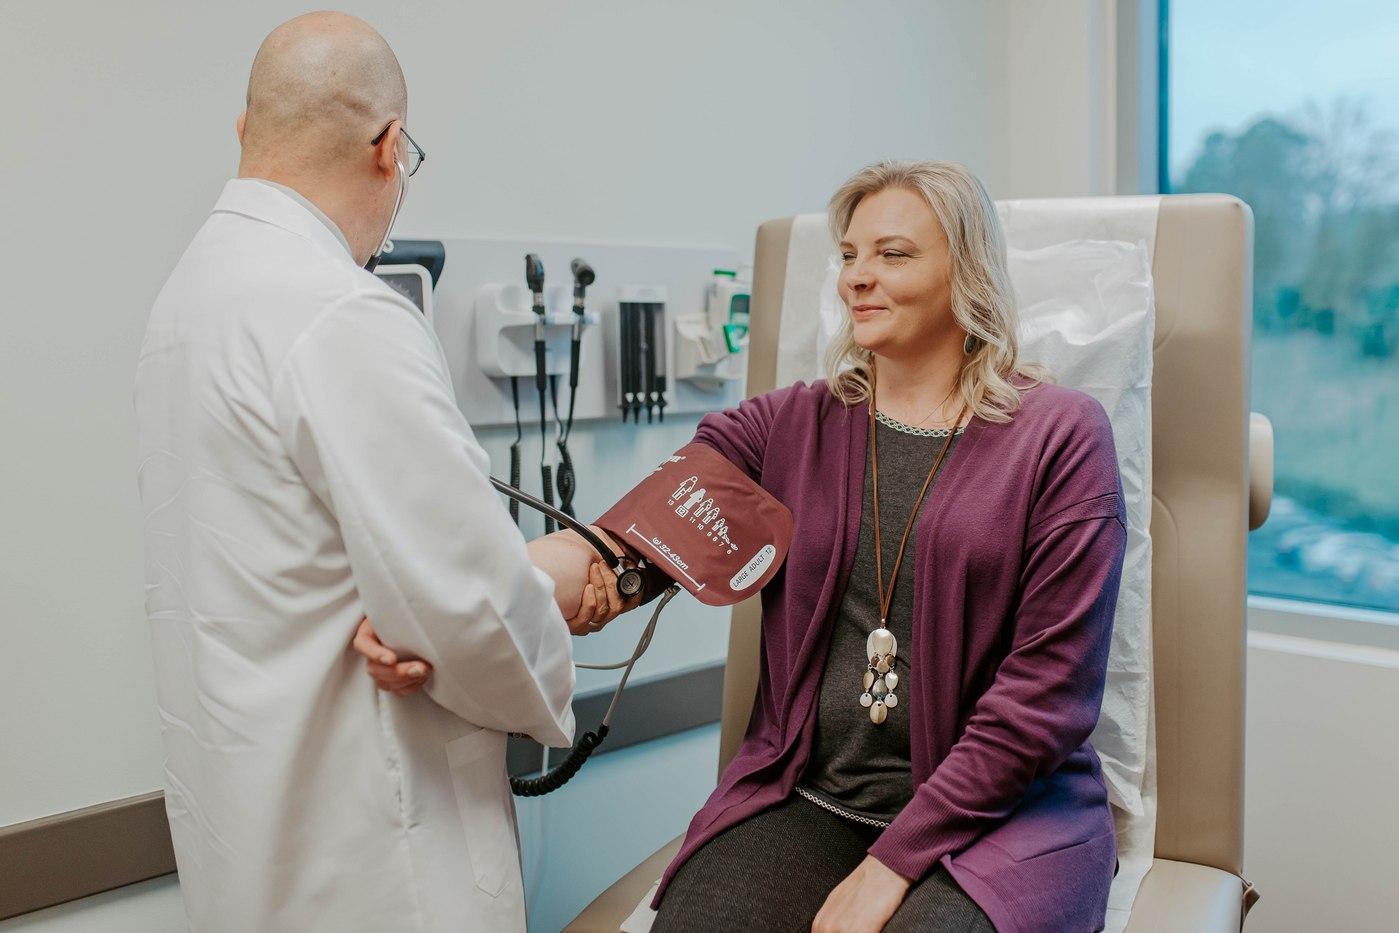 patient-with-doctor-exam-room